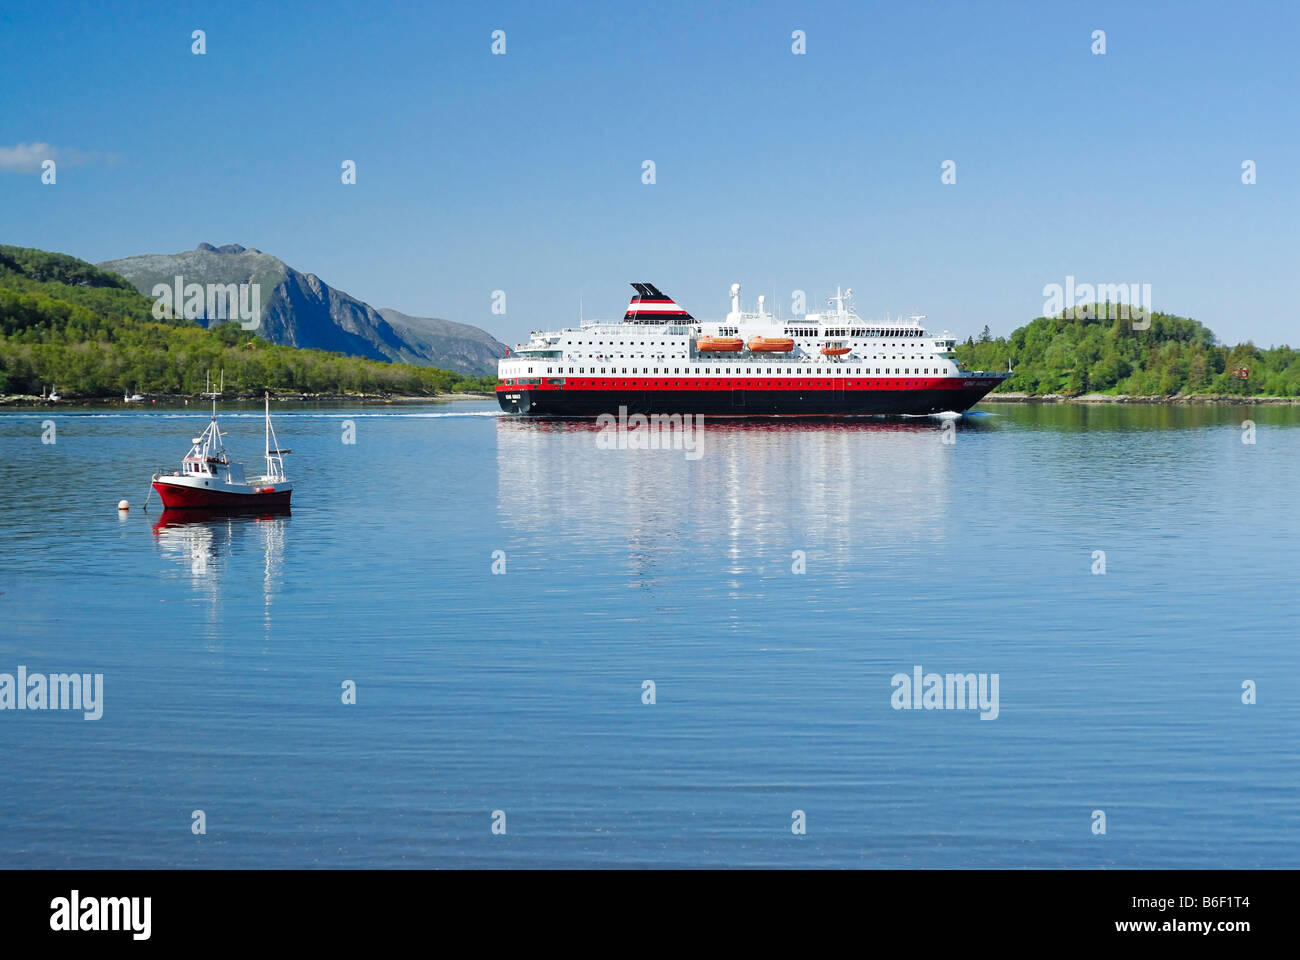 'Kong Harald' ship, Hurtigruta, Norway, Scandinavia, Europe - Stock Image